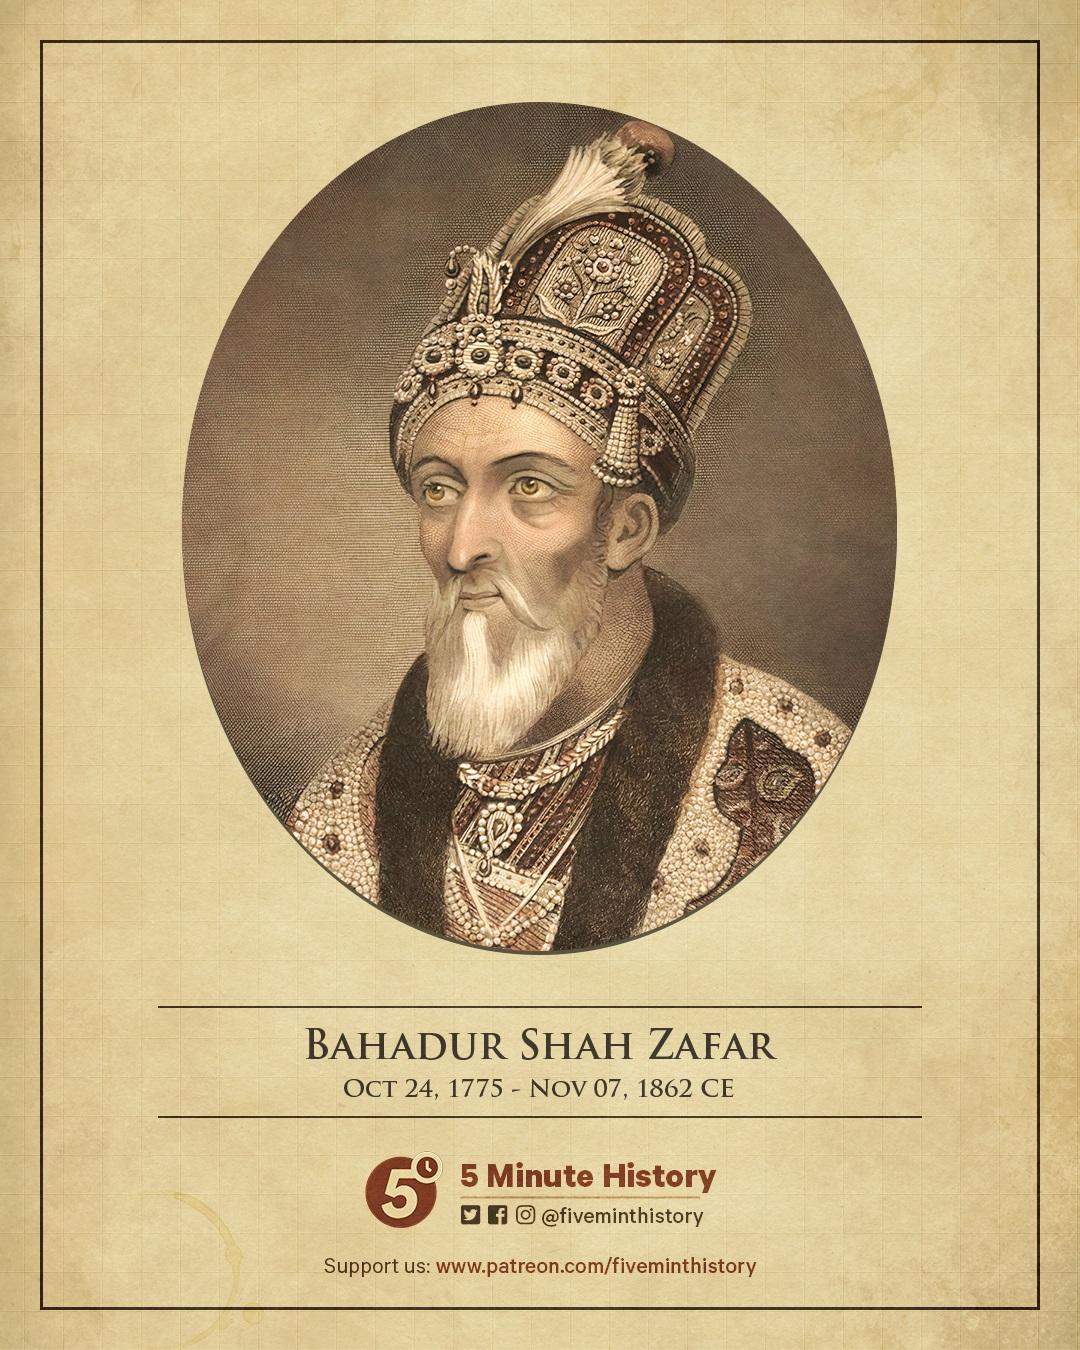 Bahadur Shah Zafar, a short biography